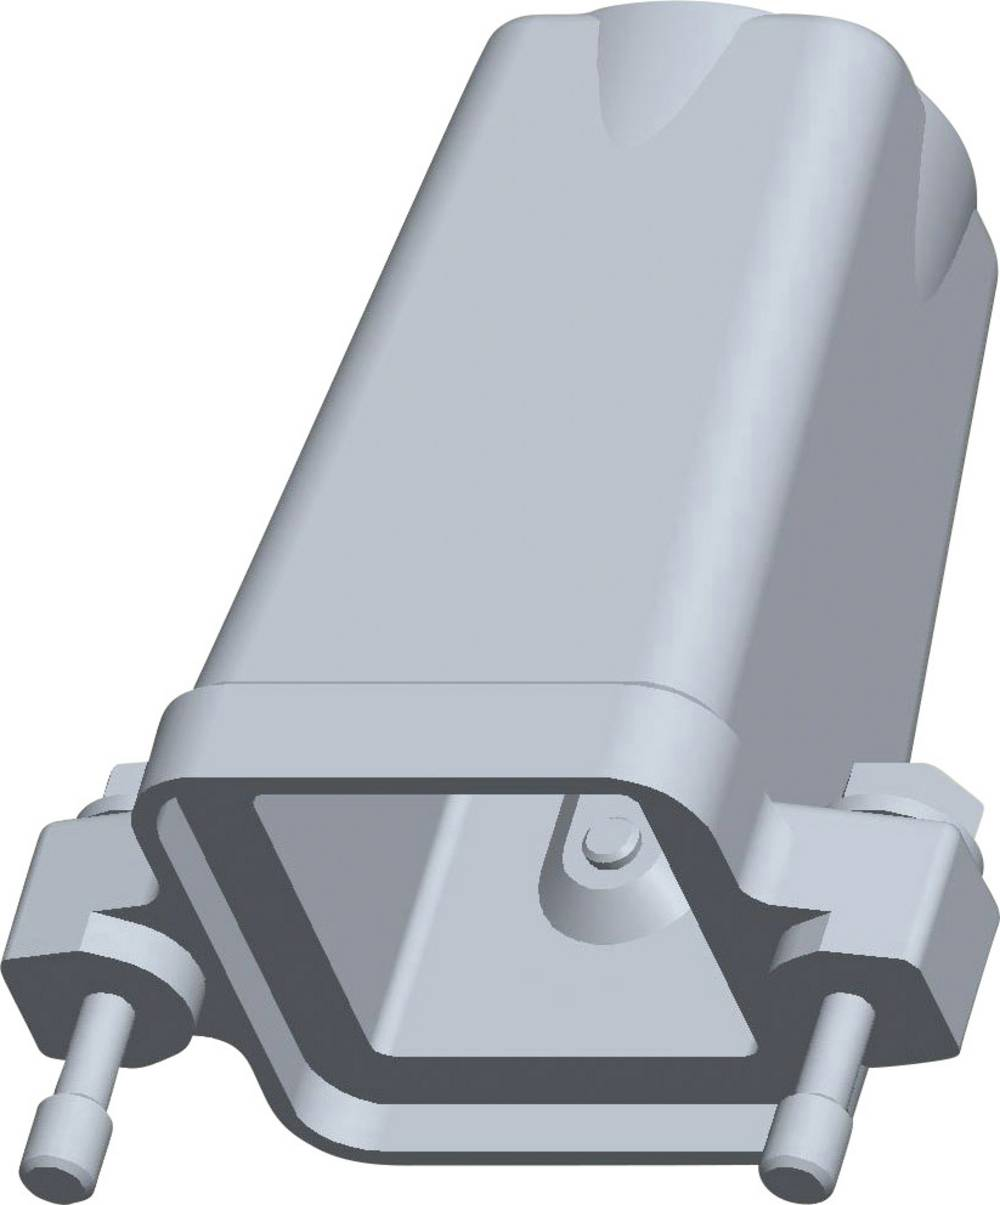 Vtično ohišje HIP-K.3/4.STO.1.M20.G 1106408-3 TE Connectivity 1 kos